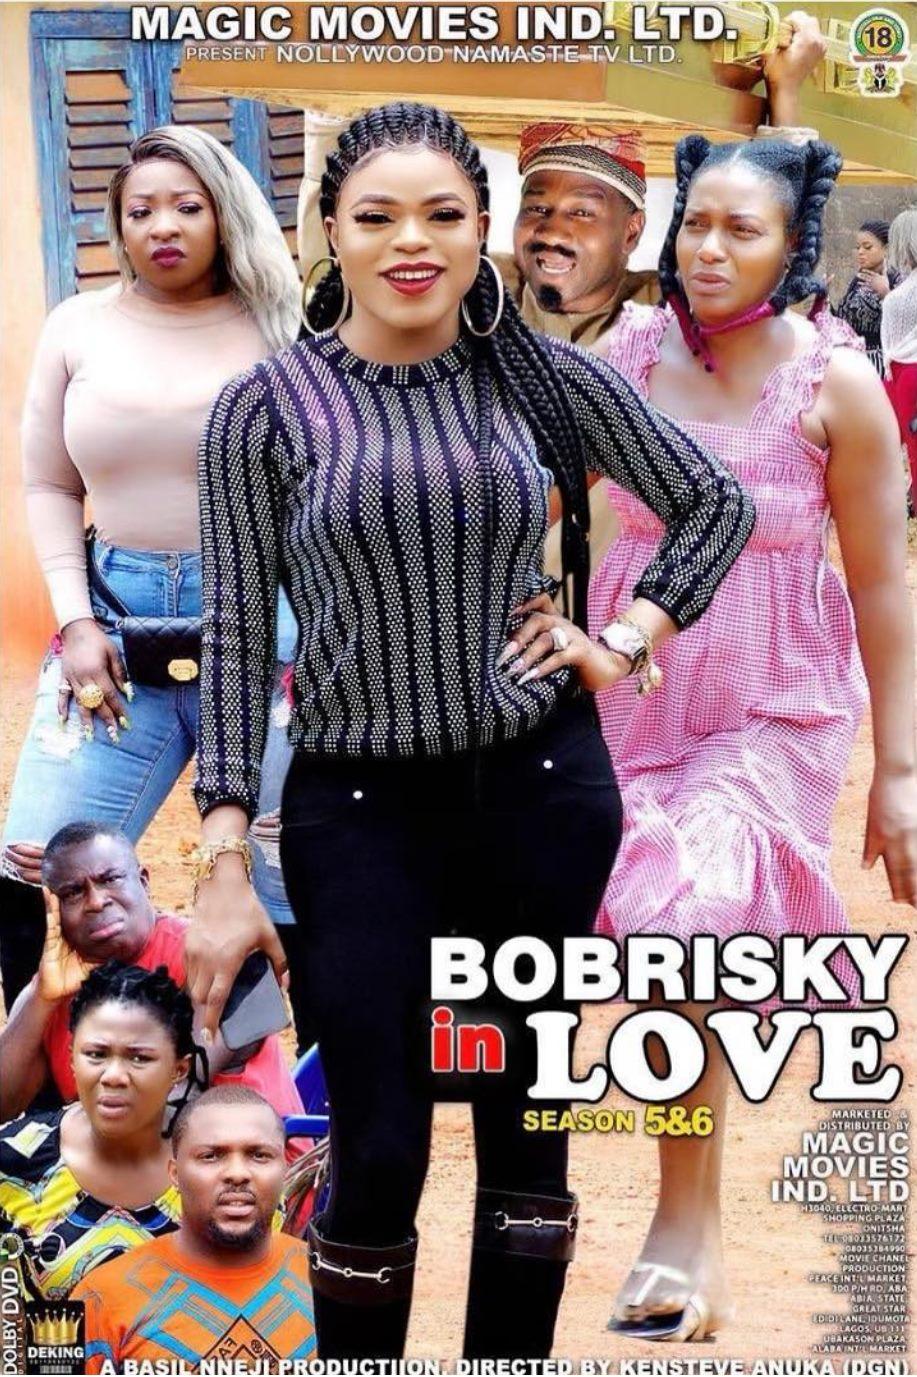 FG Investigating Bobrisky's Movie